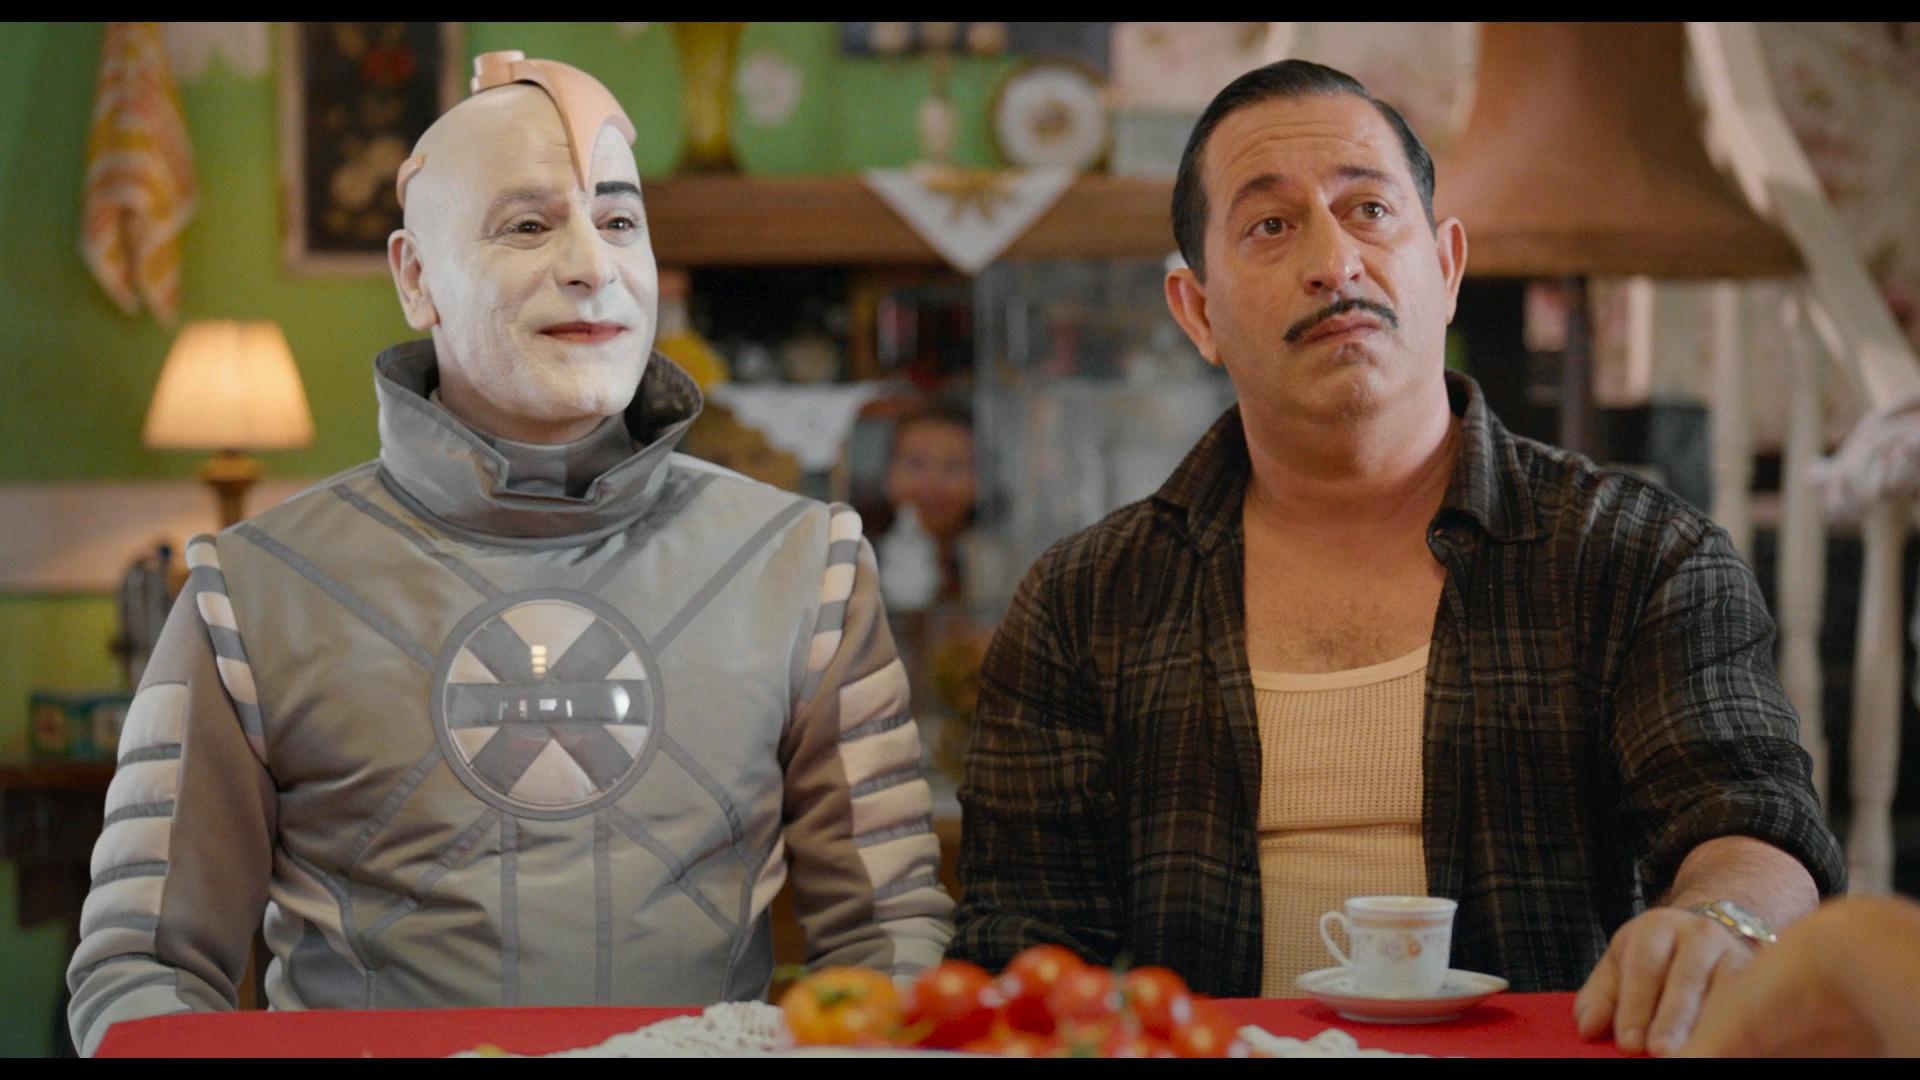 Arif V 216 | 2018 | Yerli Film | NF | WEB-DL | XviD | Sansürsüz | 1080p - m720p - m1080p | WEB-DL | Tek Link